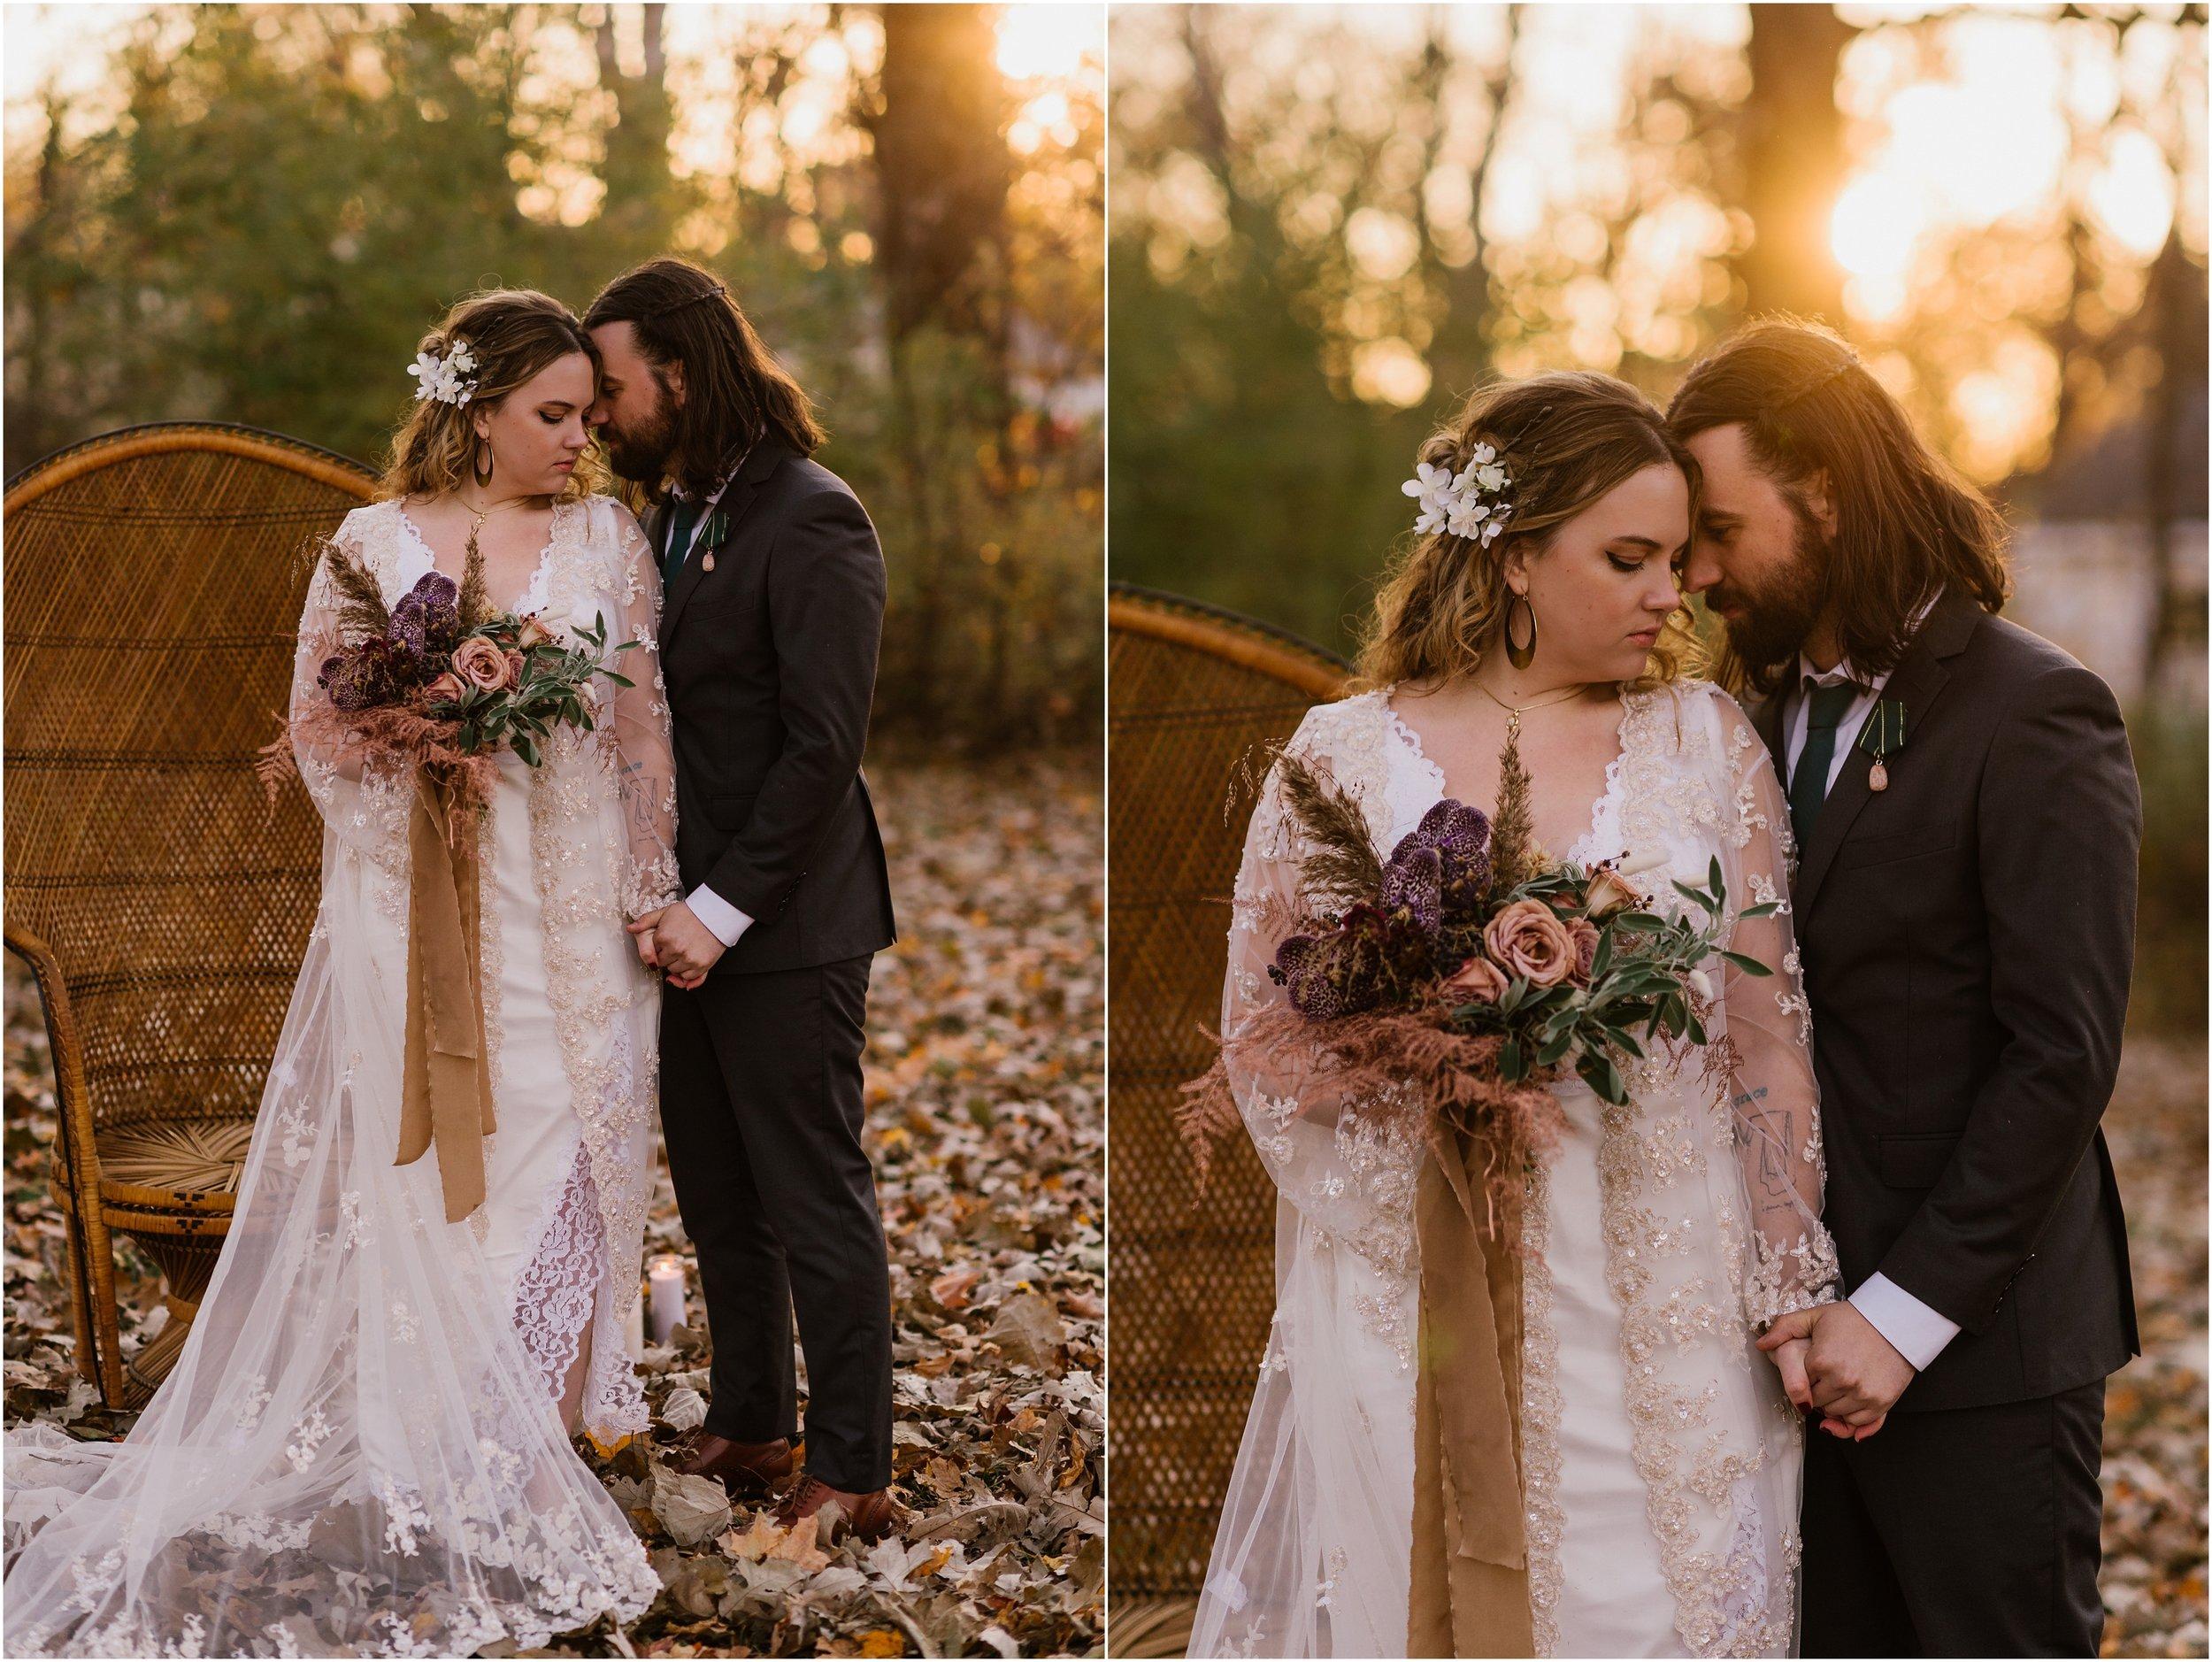 Rebecca_Shehorn_Photography_Indianapolis_Wedding_Photographer_9435.jpg